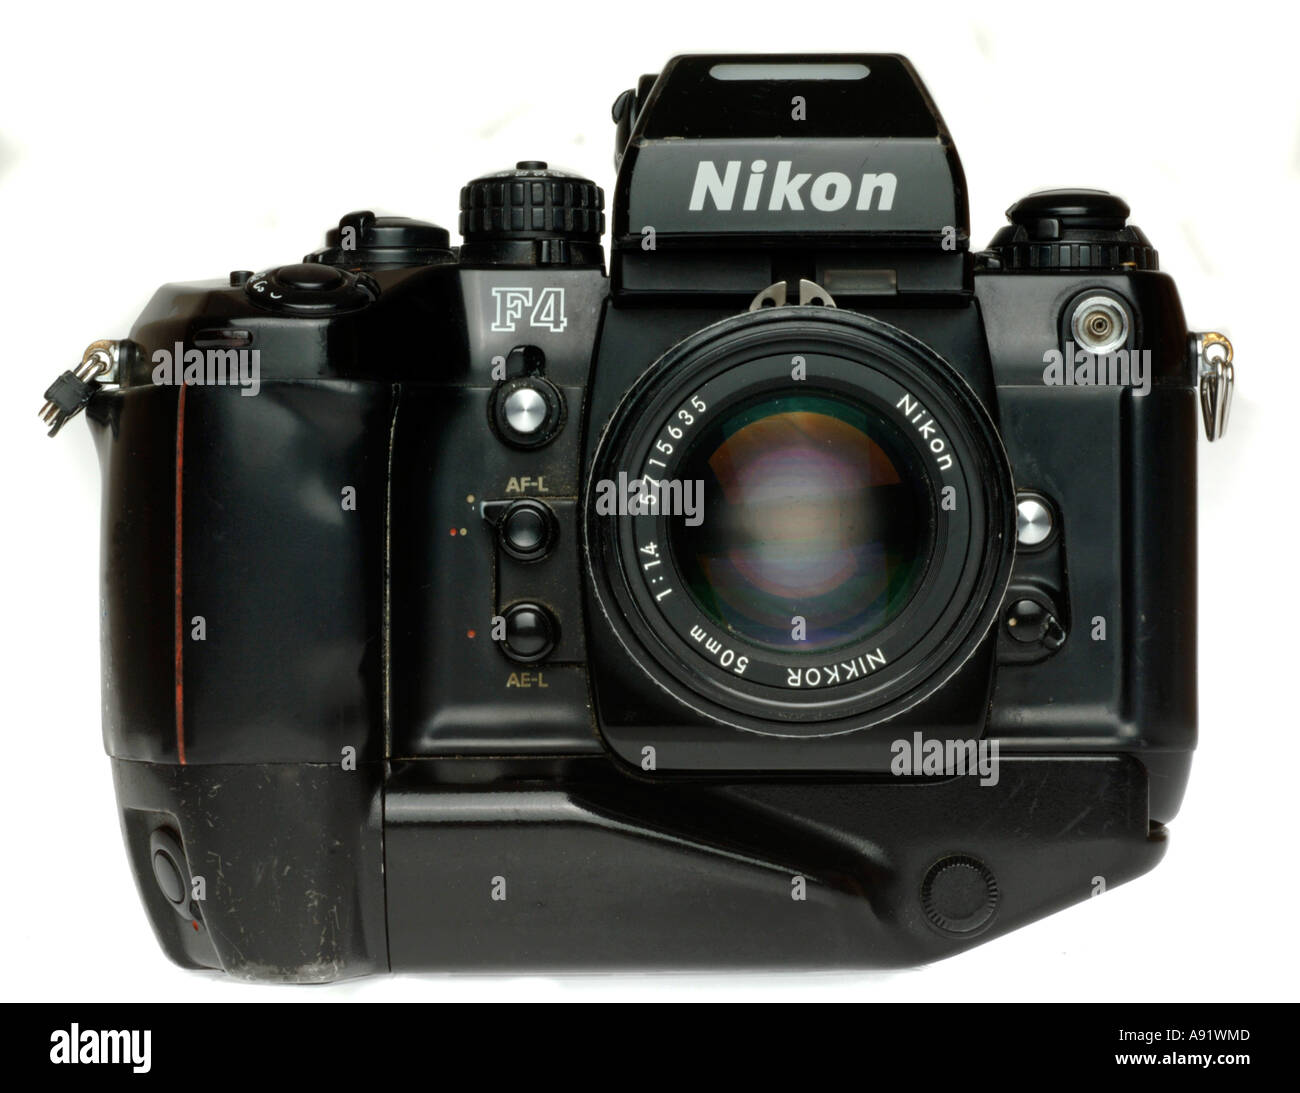 nikon f4 35mm film camera stock photos nikon f4 35mm film camera rh alamy com Nikon F4 Review Nikon F3